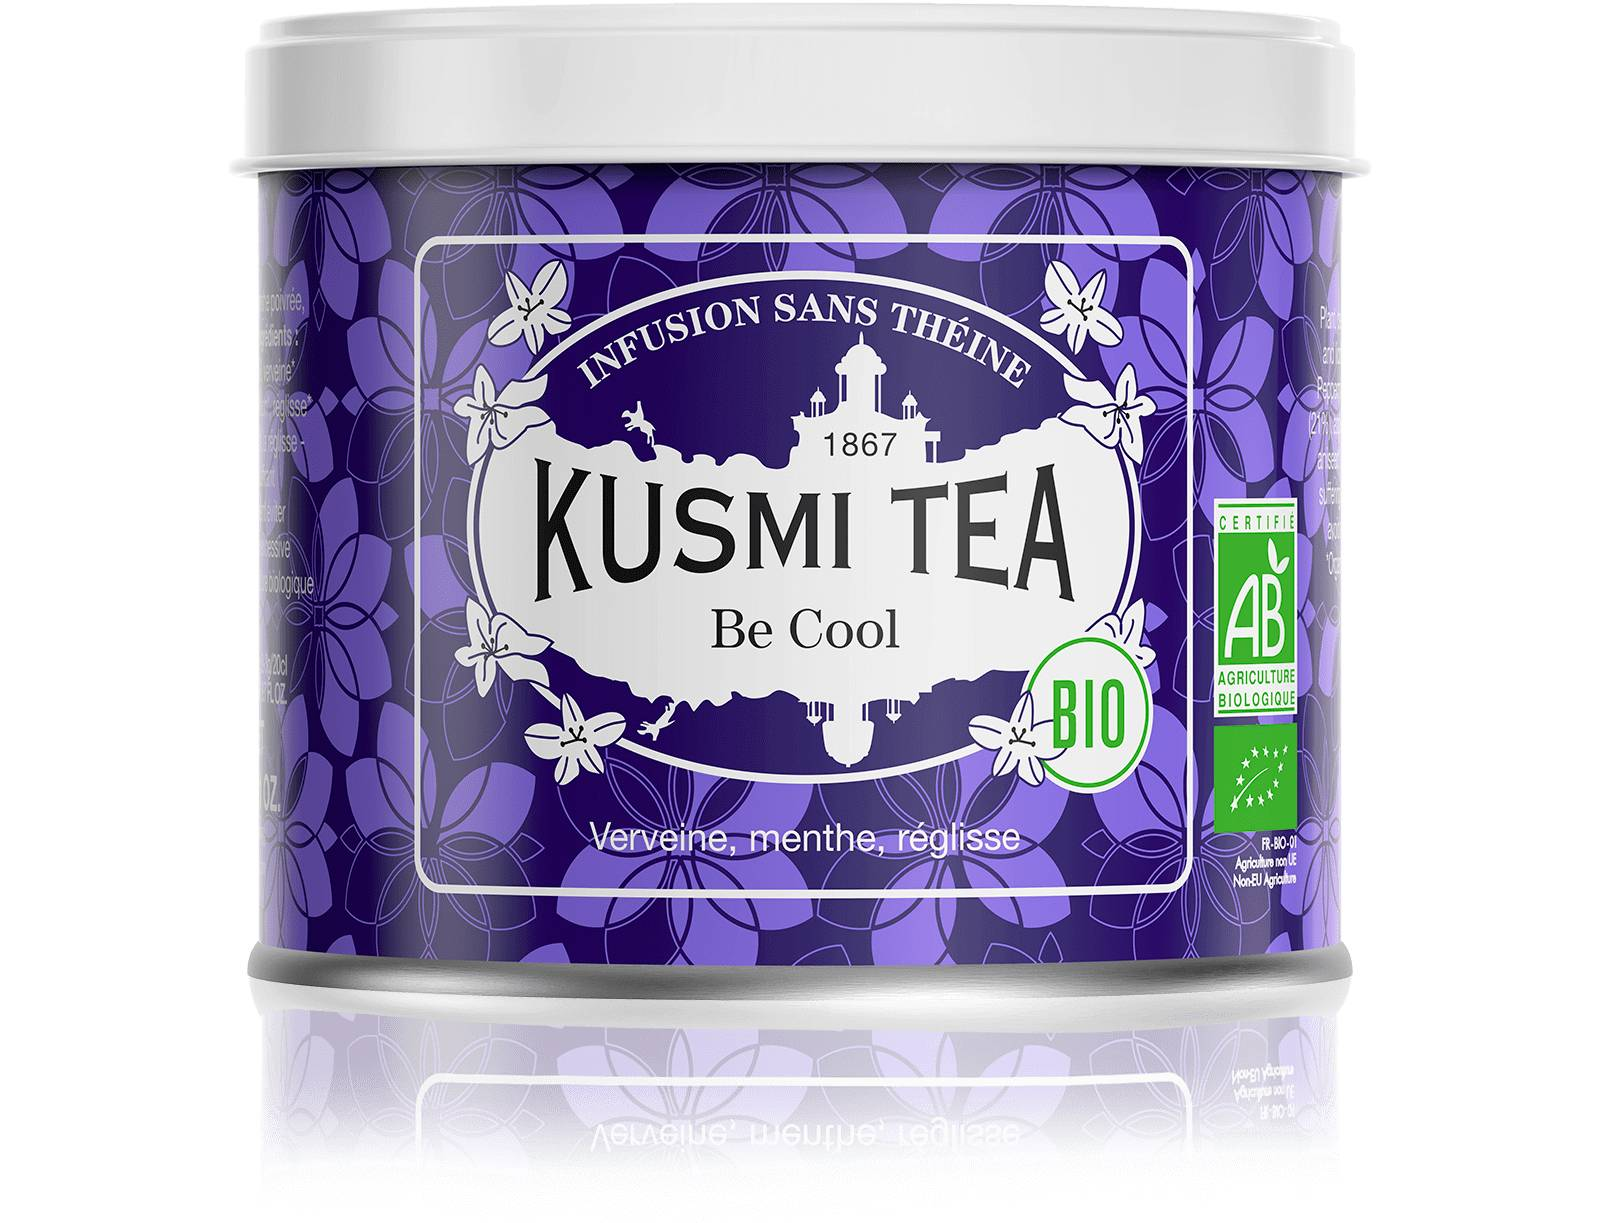 KUSMI TEA Be Cool bio - Infusion verveine - Boîte de thé en vrac - Kusmi Tea